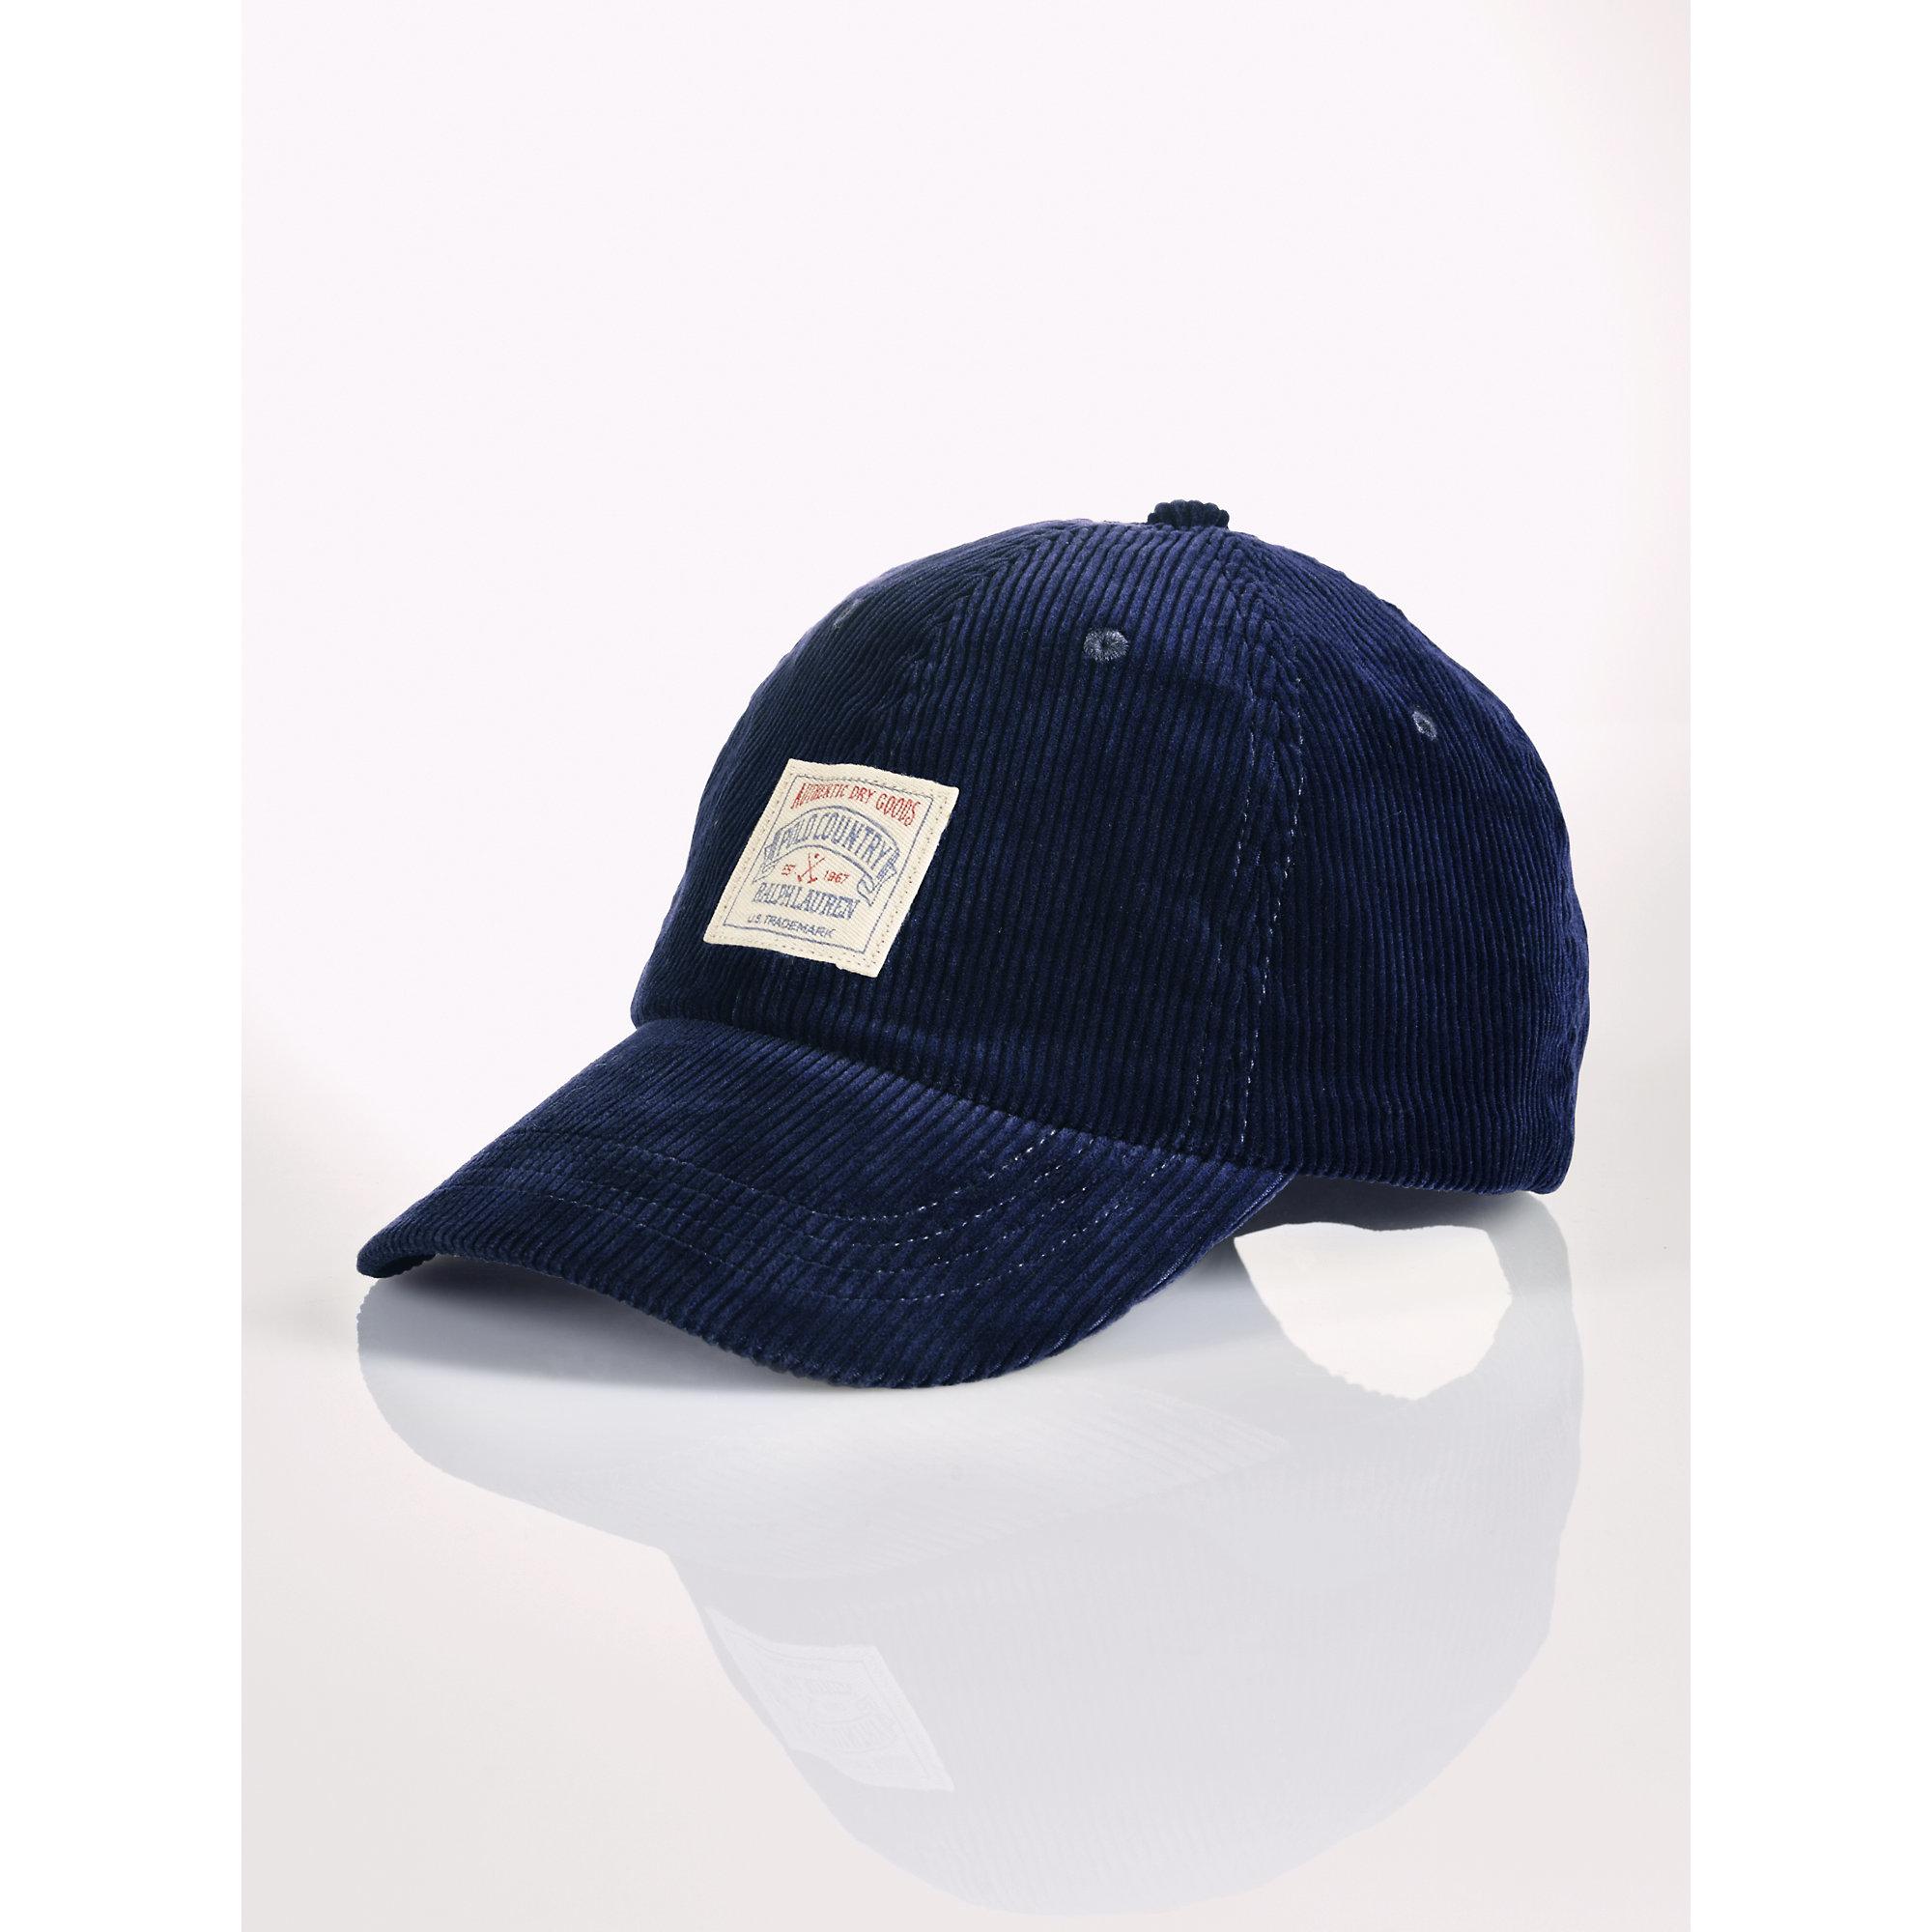 1e7ad1cb30d Lyst - Polo Ralph Lauren Corduroy Hat in Blue for Men